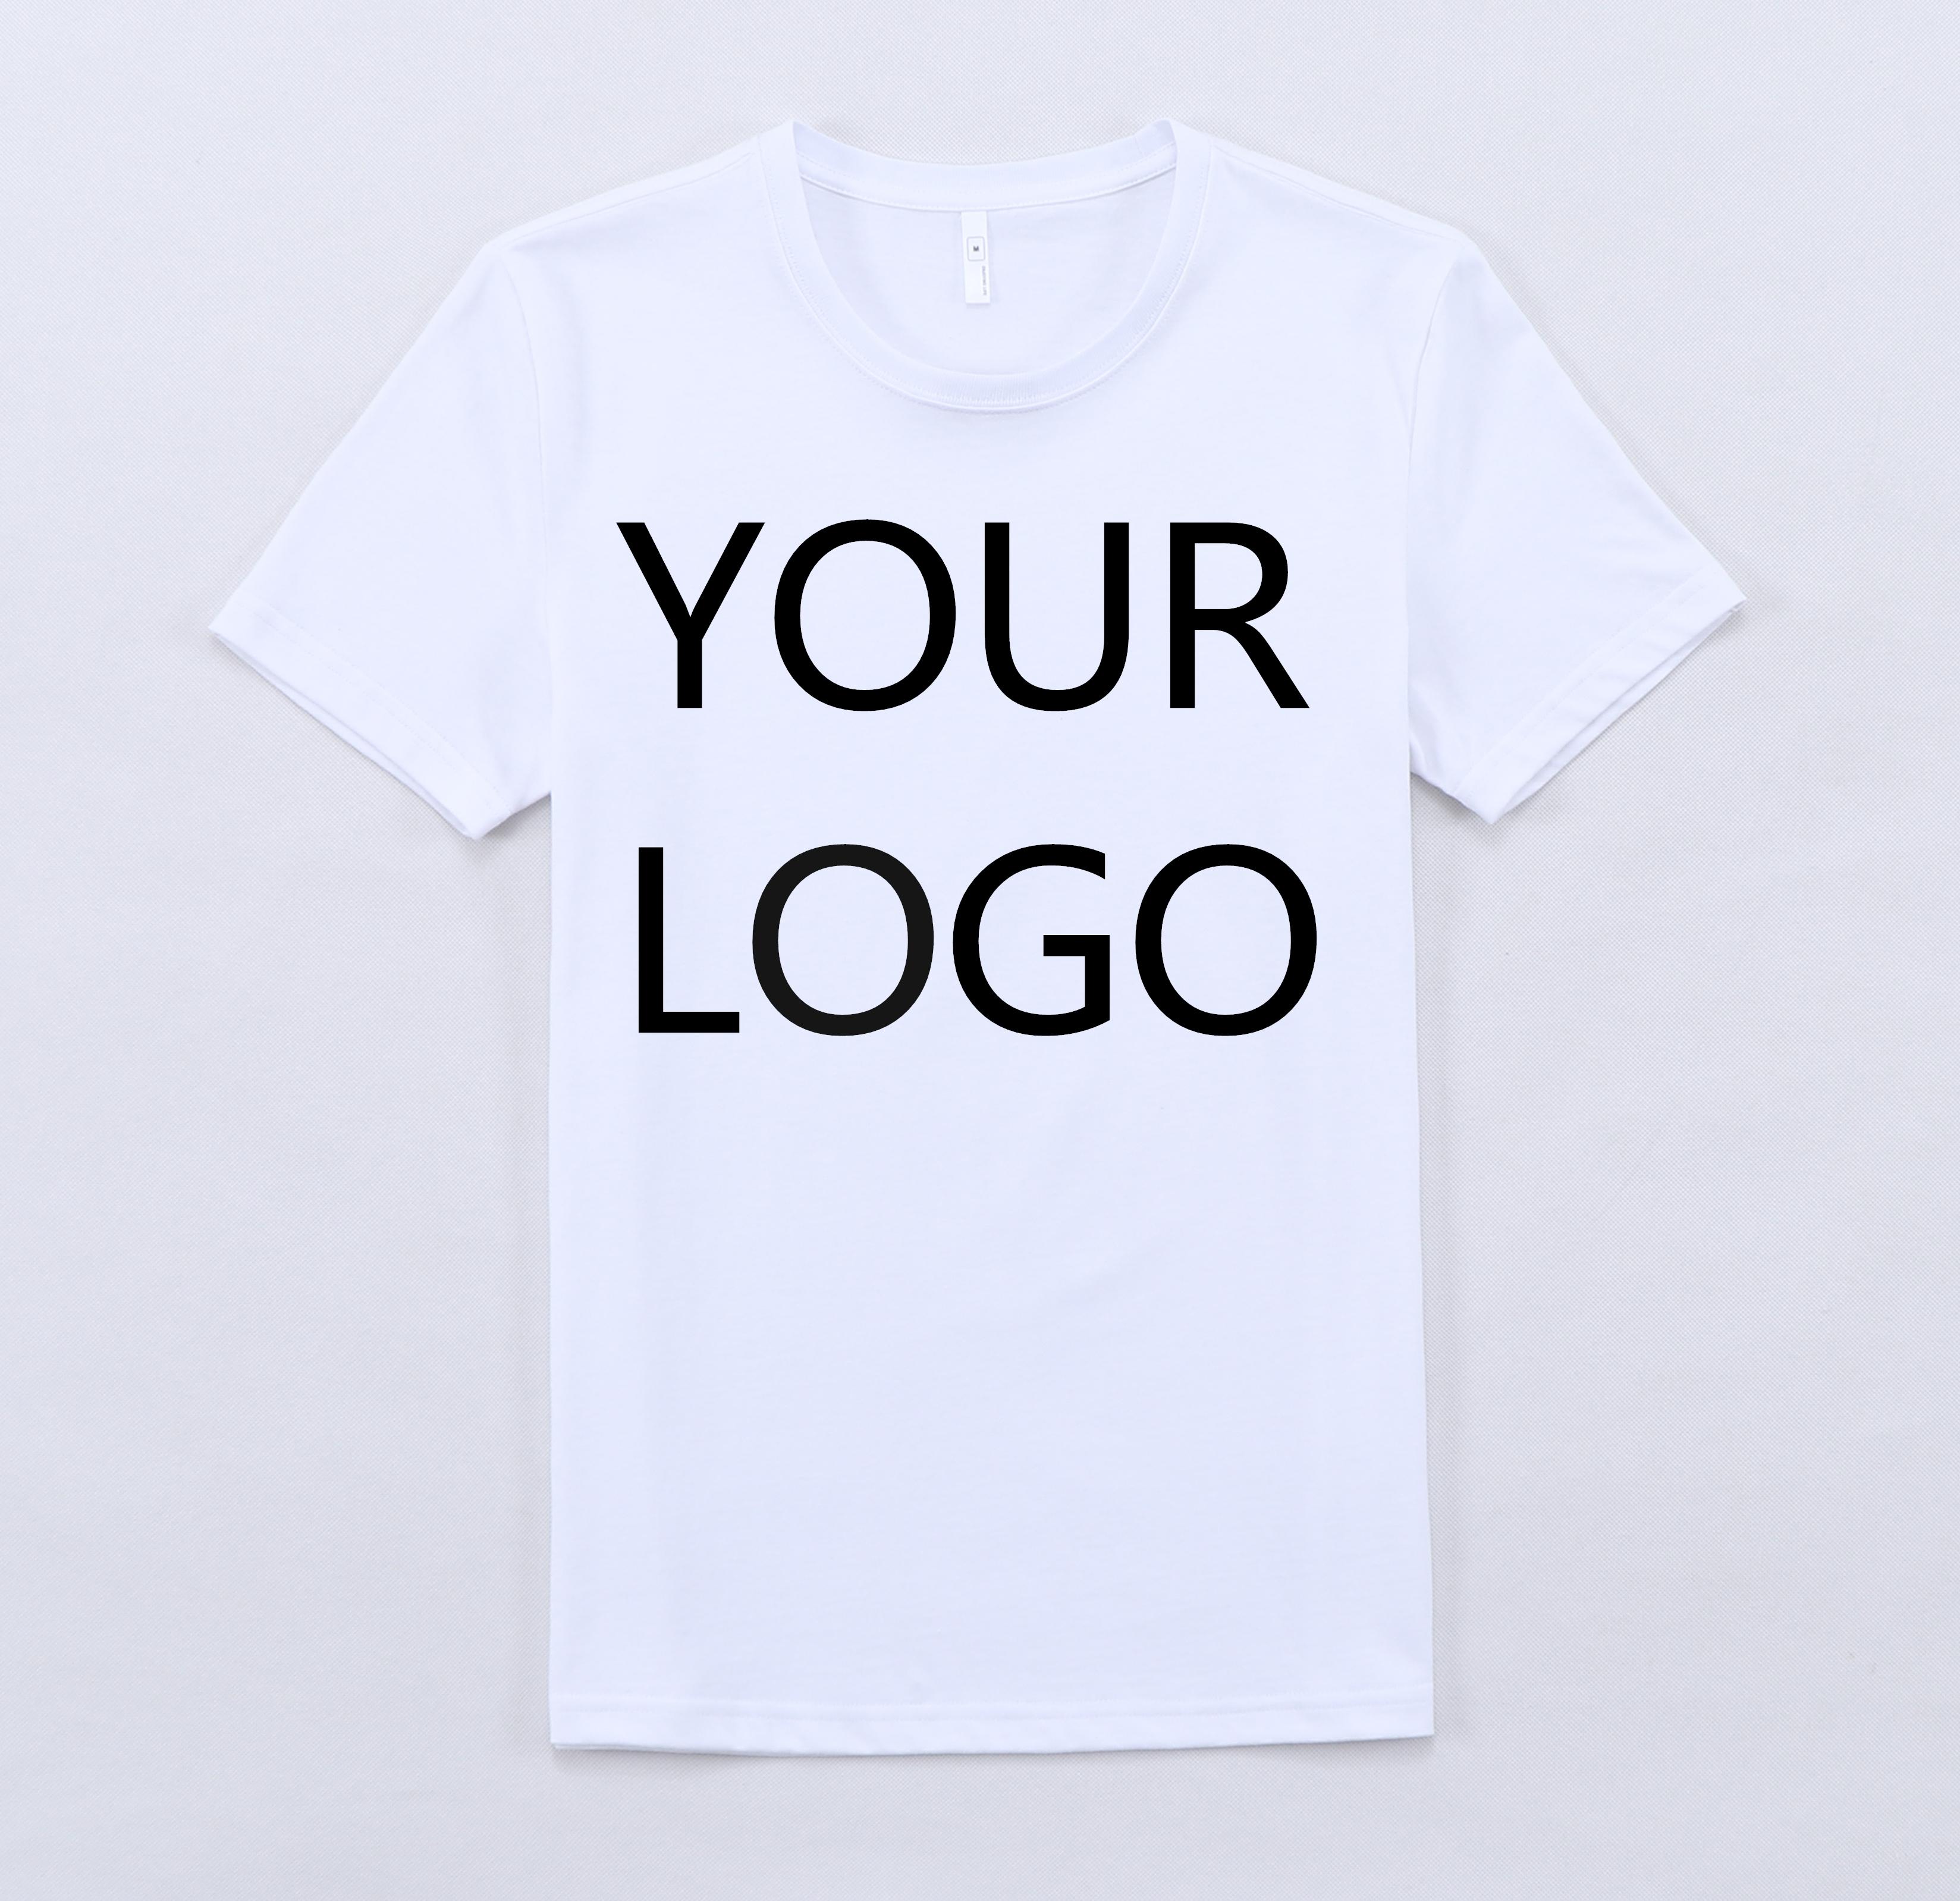 011a07b9 100% cotton white t shirts, customized t shirts custom printing, breathable  plain t-shirts for men